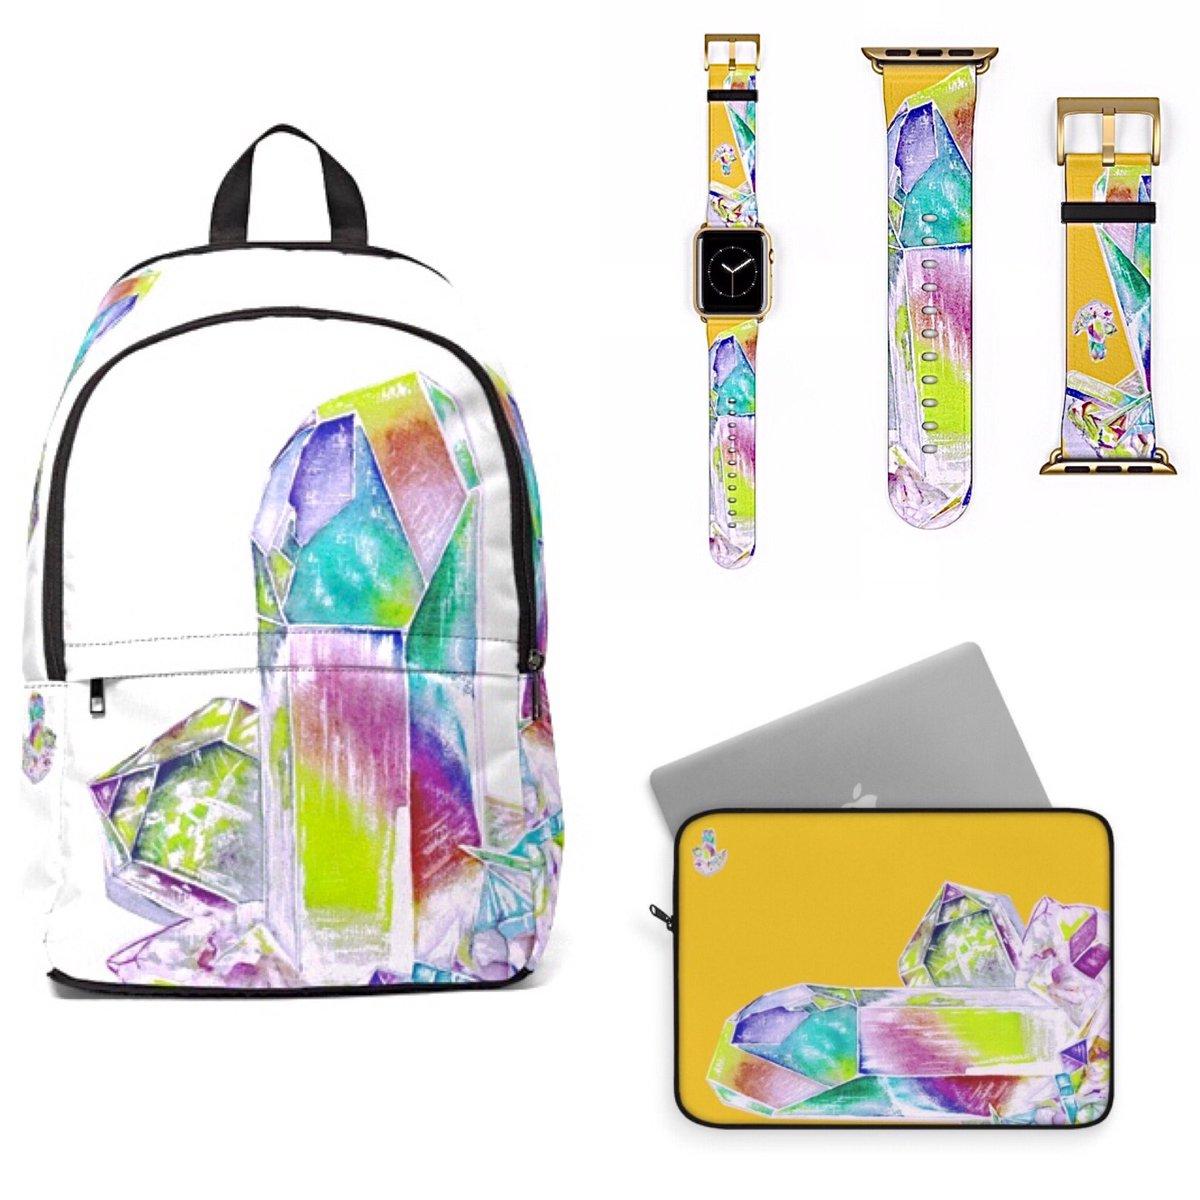 Mochila  multicolor unisex backpack white multicolor quarz , sports accessory, bag,studios, bag, wallet, made to order, watercolor …http://illustration.miyoarte.patternbyetsy.com/listing/817316…pic.twitter.com/wuXtDBSKA4